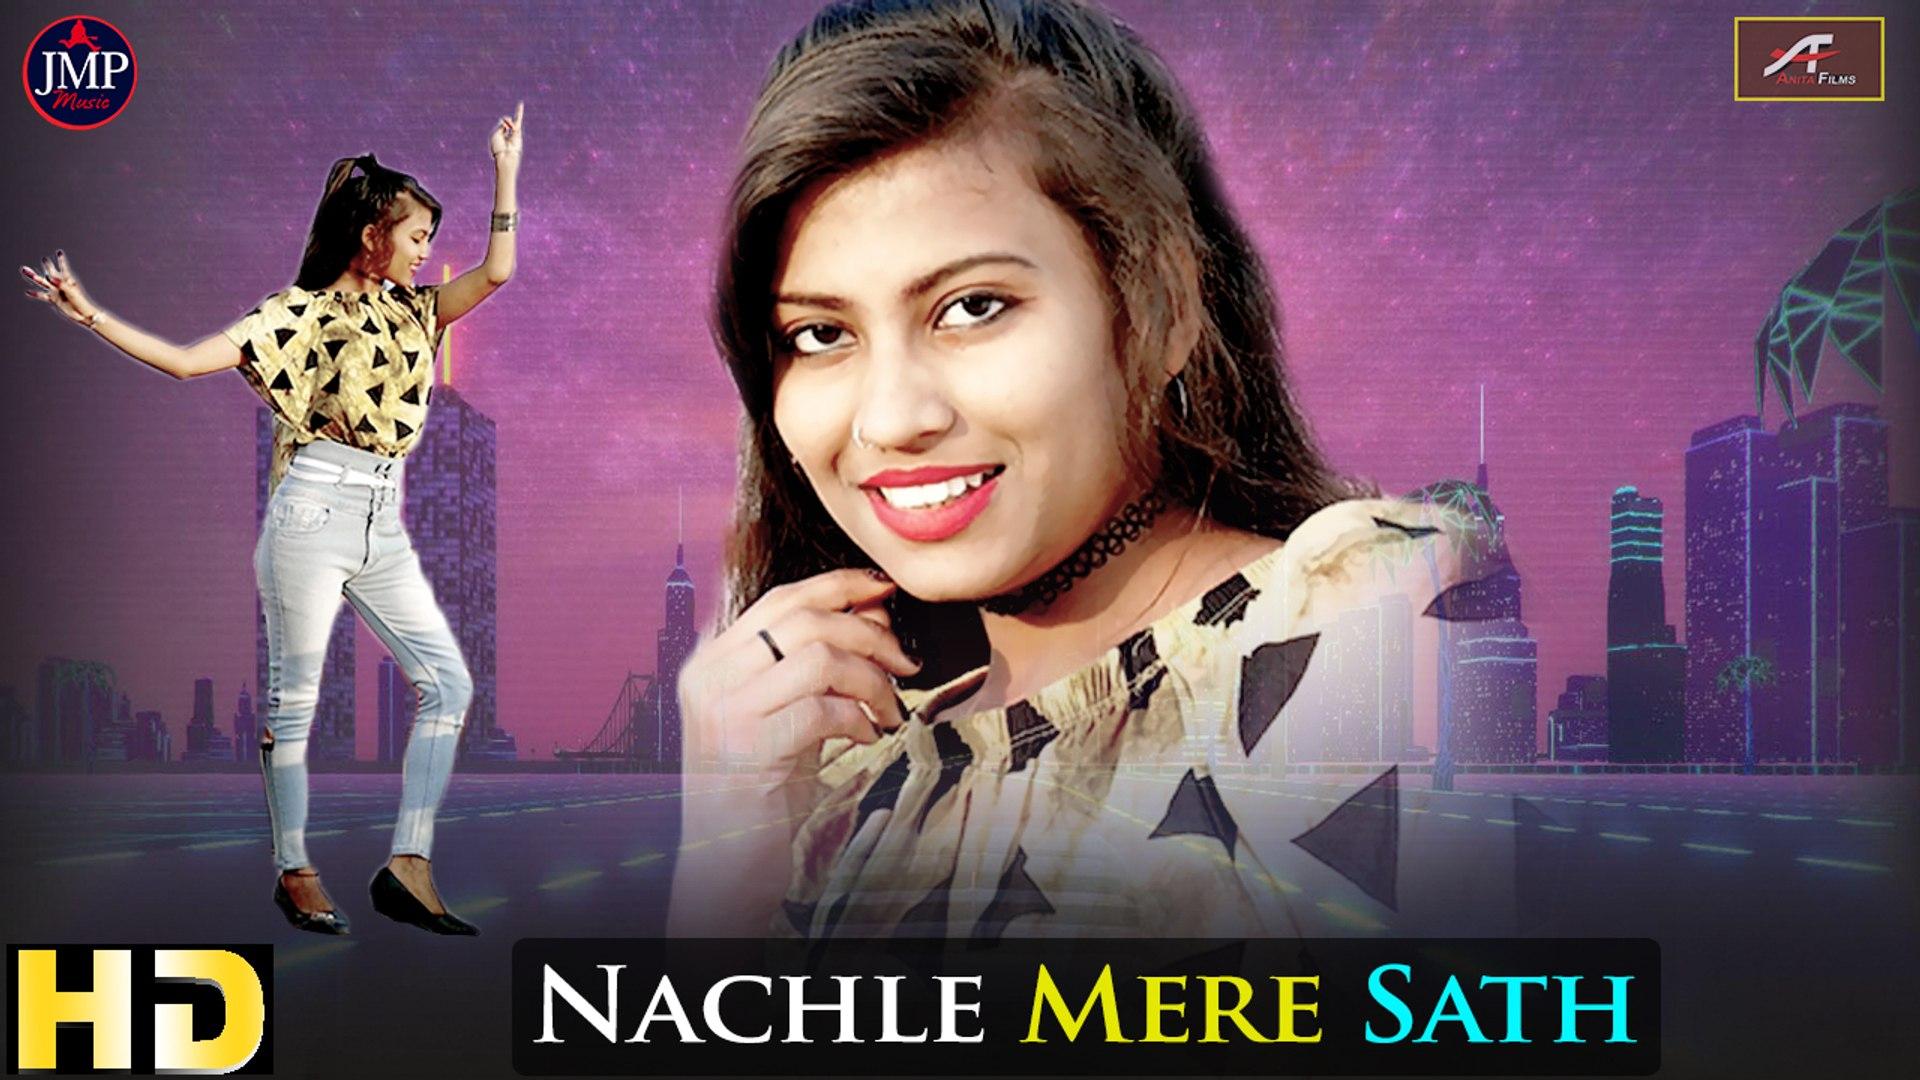 New Hindi Songs 2019 - Nachle Mere Saath - FULL Song |  Komal Prajapati - Harsh Vyas - Shraddha Chau